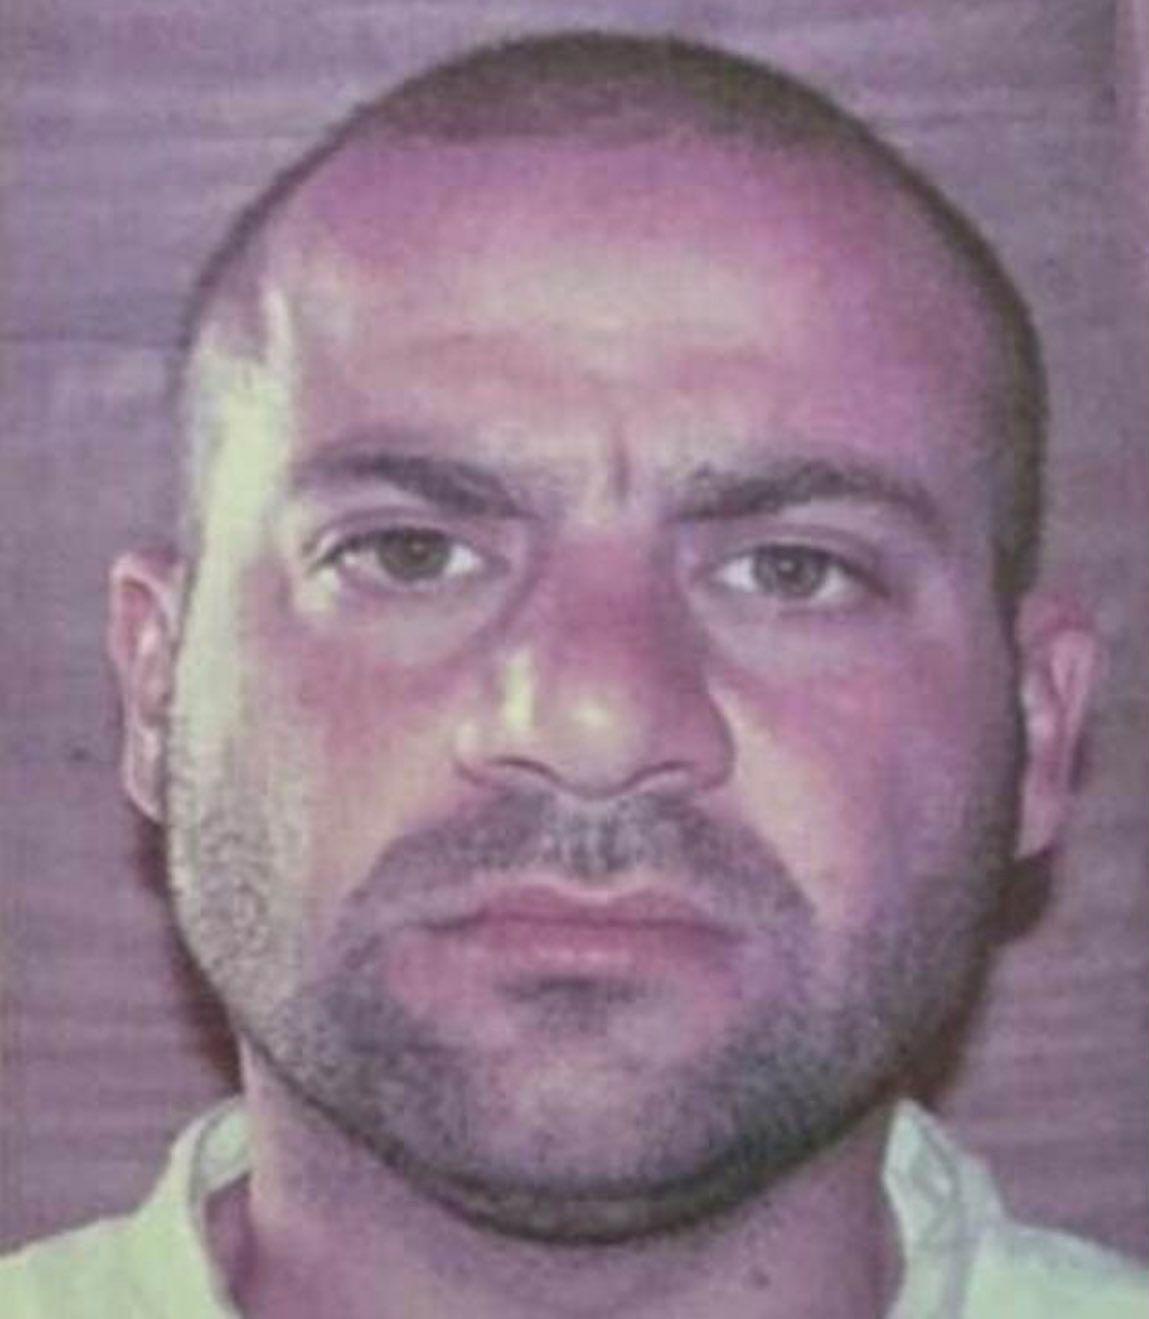 Amir Mohammed Abdul Rahman al-Mawli al-Salbi/ Islamischer Staat